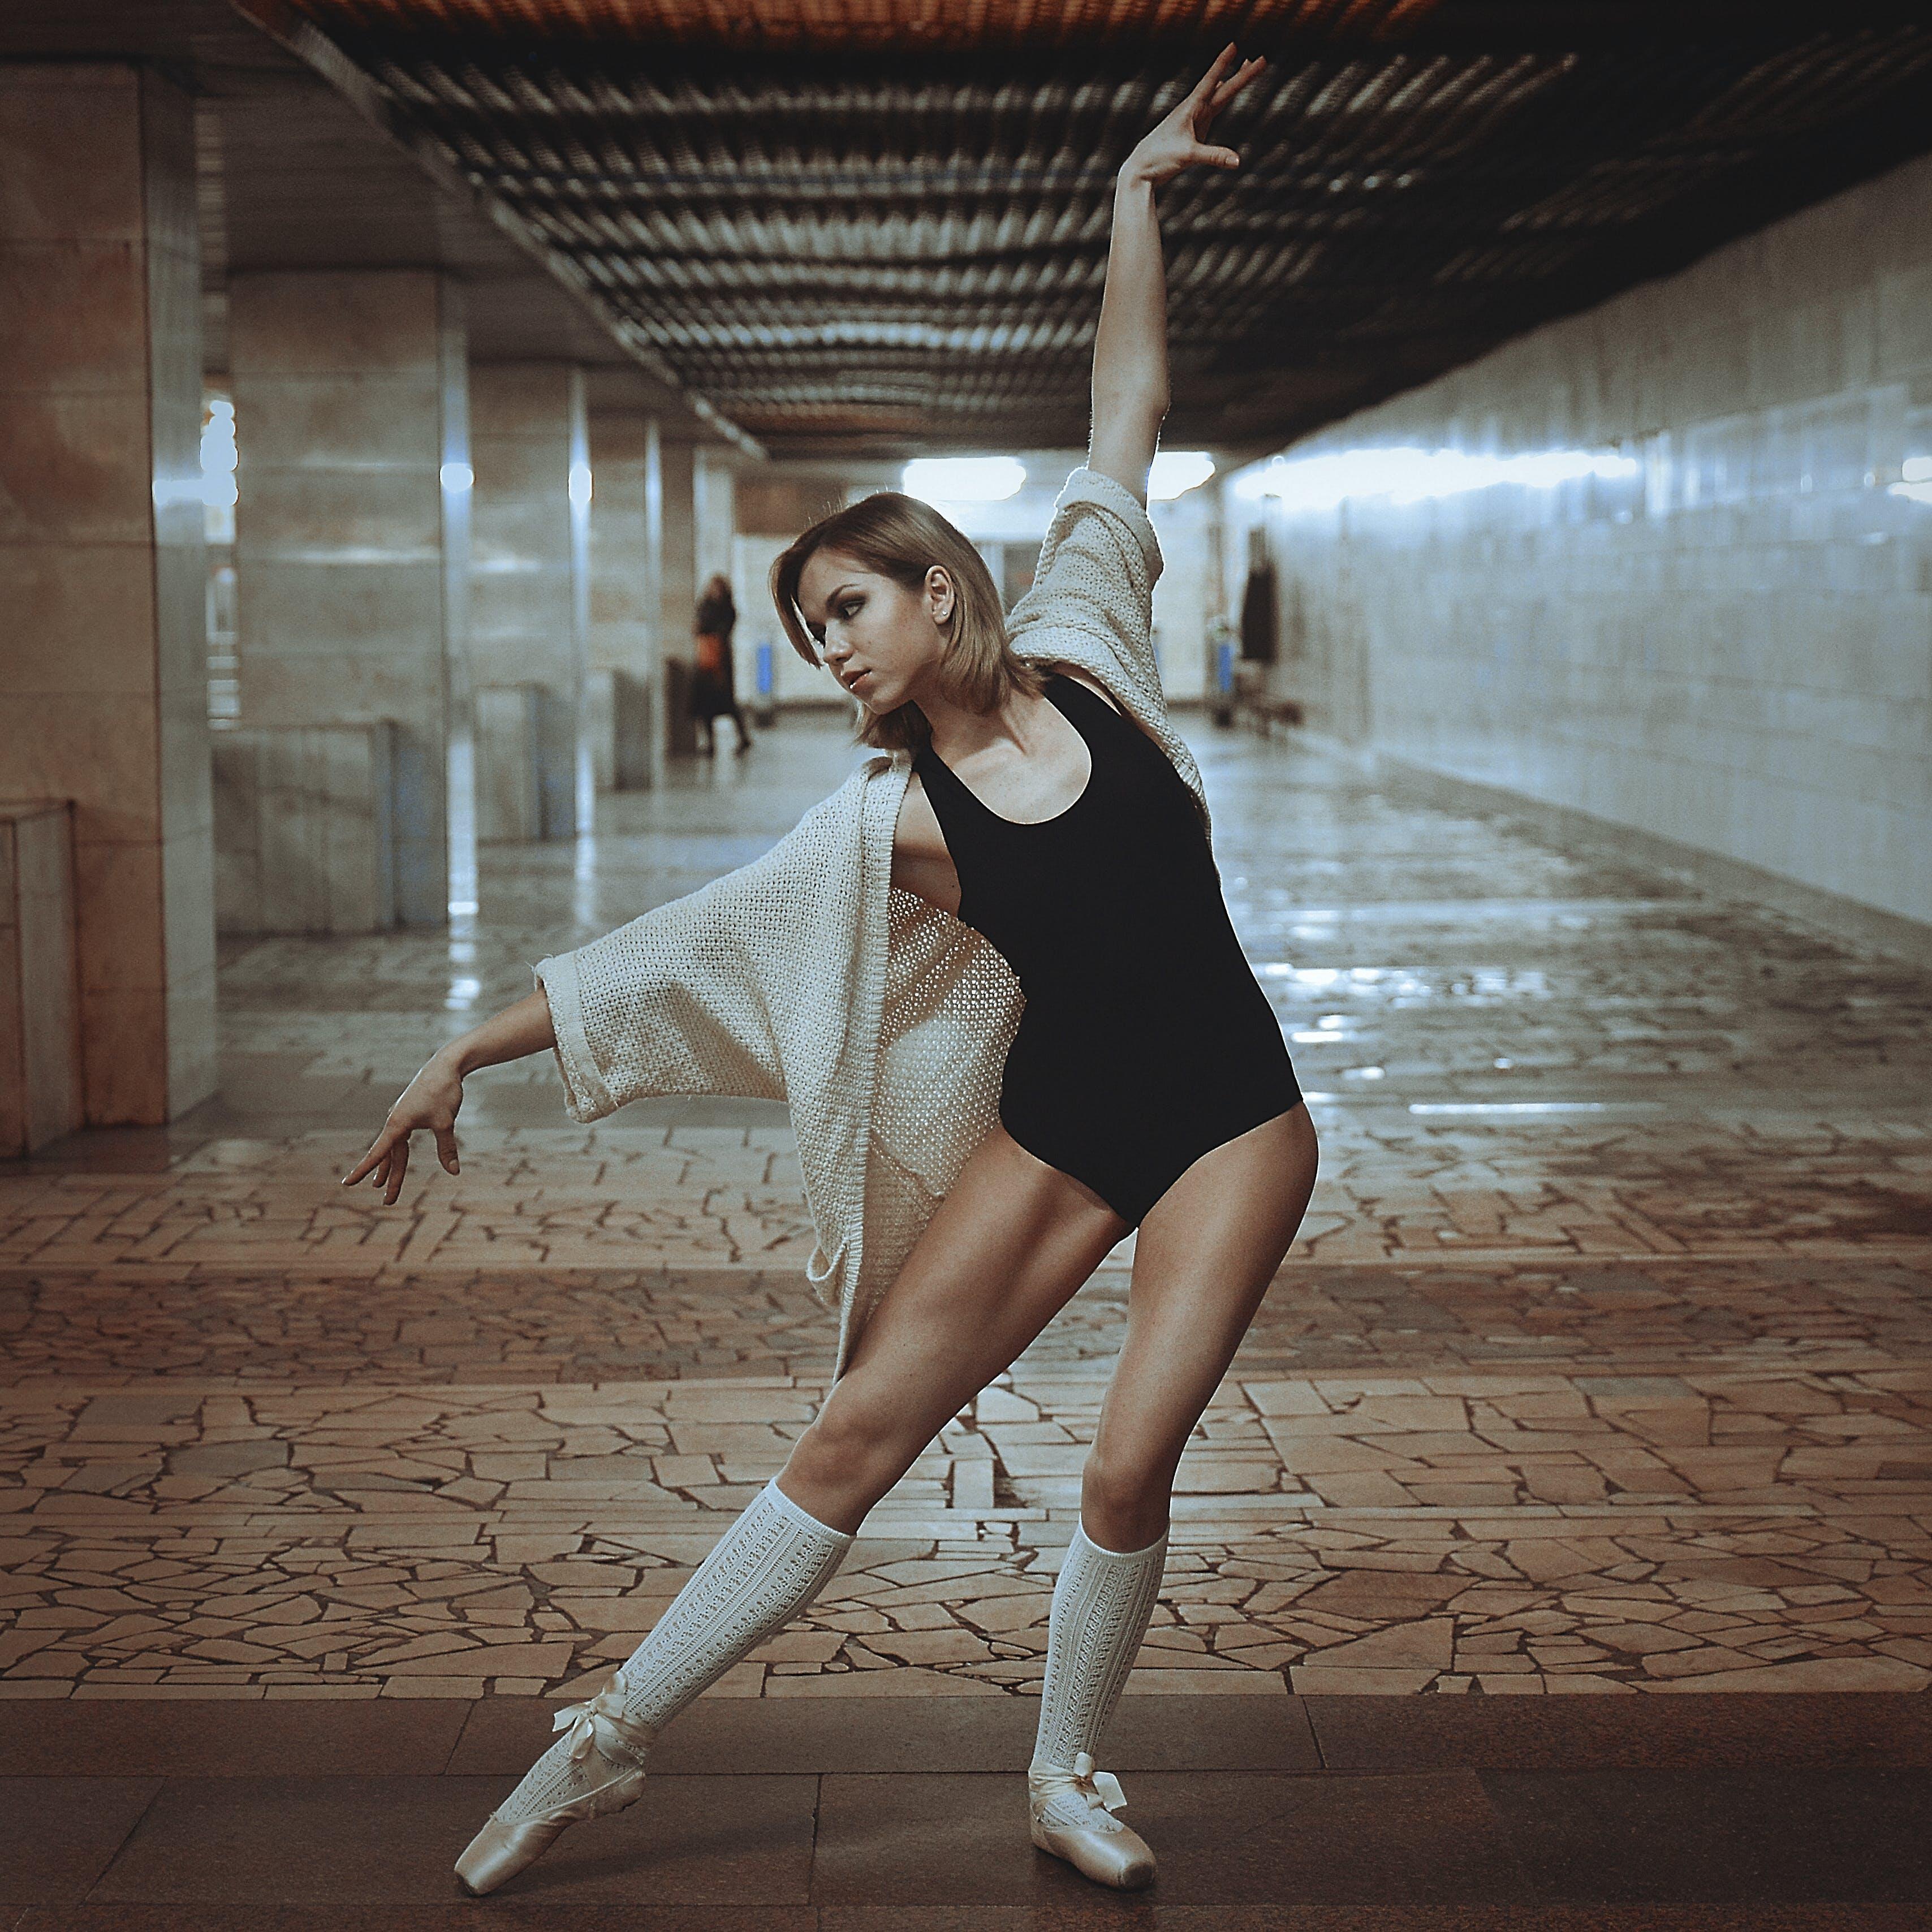 Woman Doing Ballet Pose